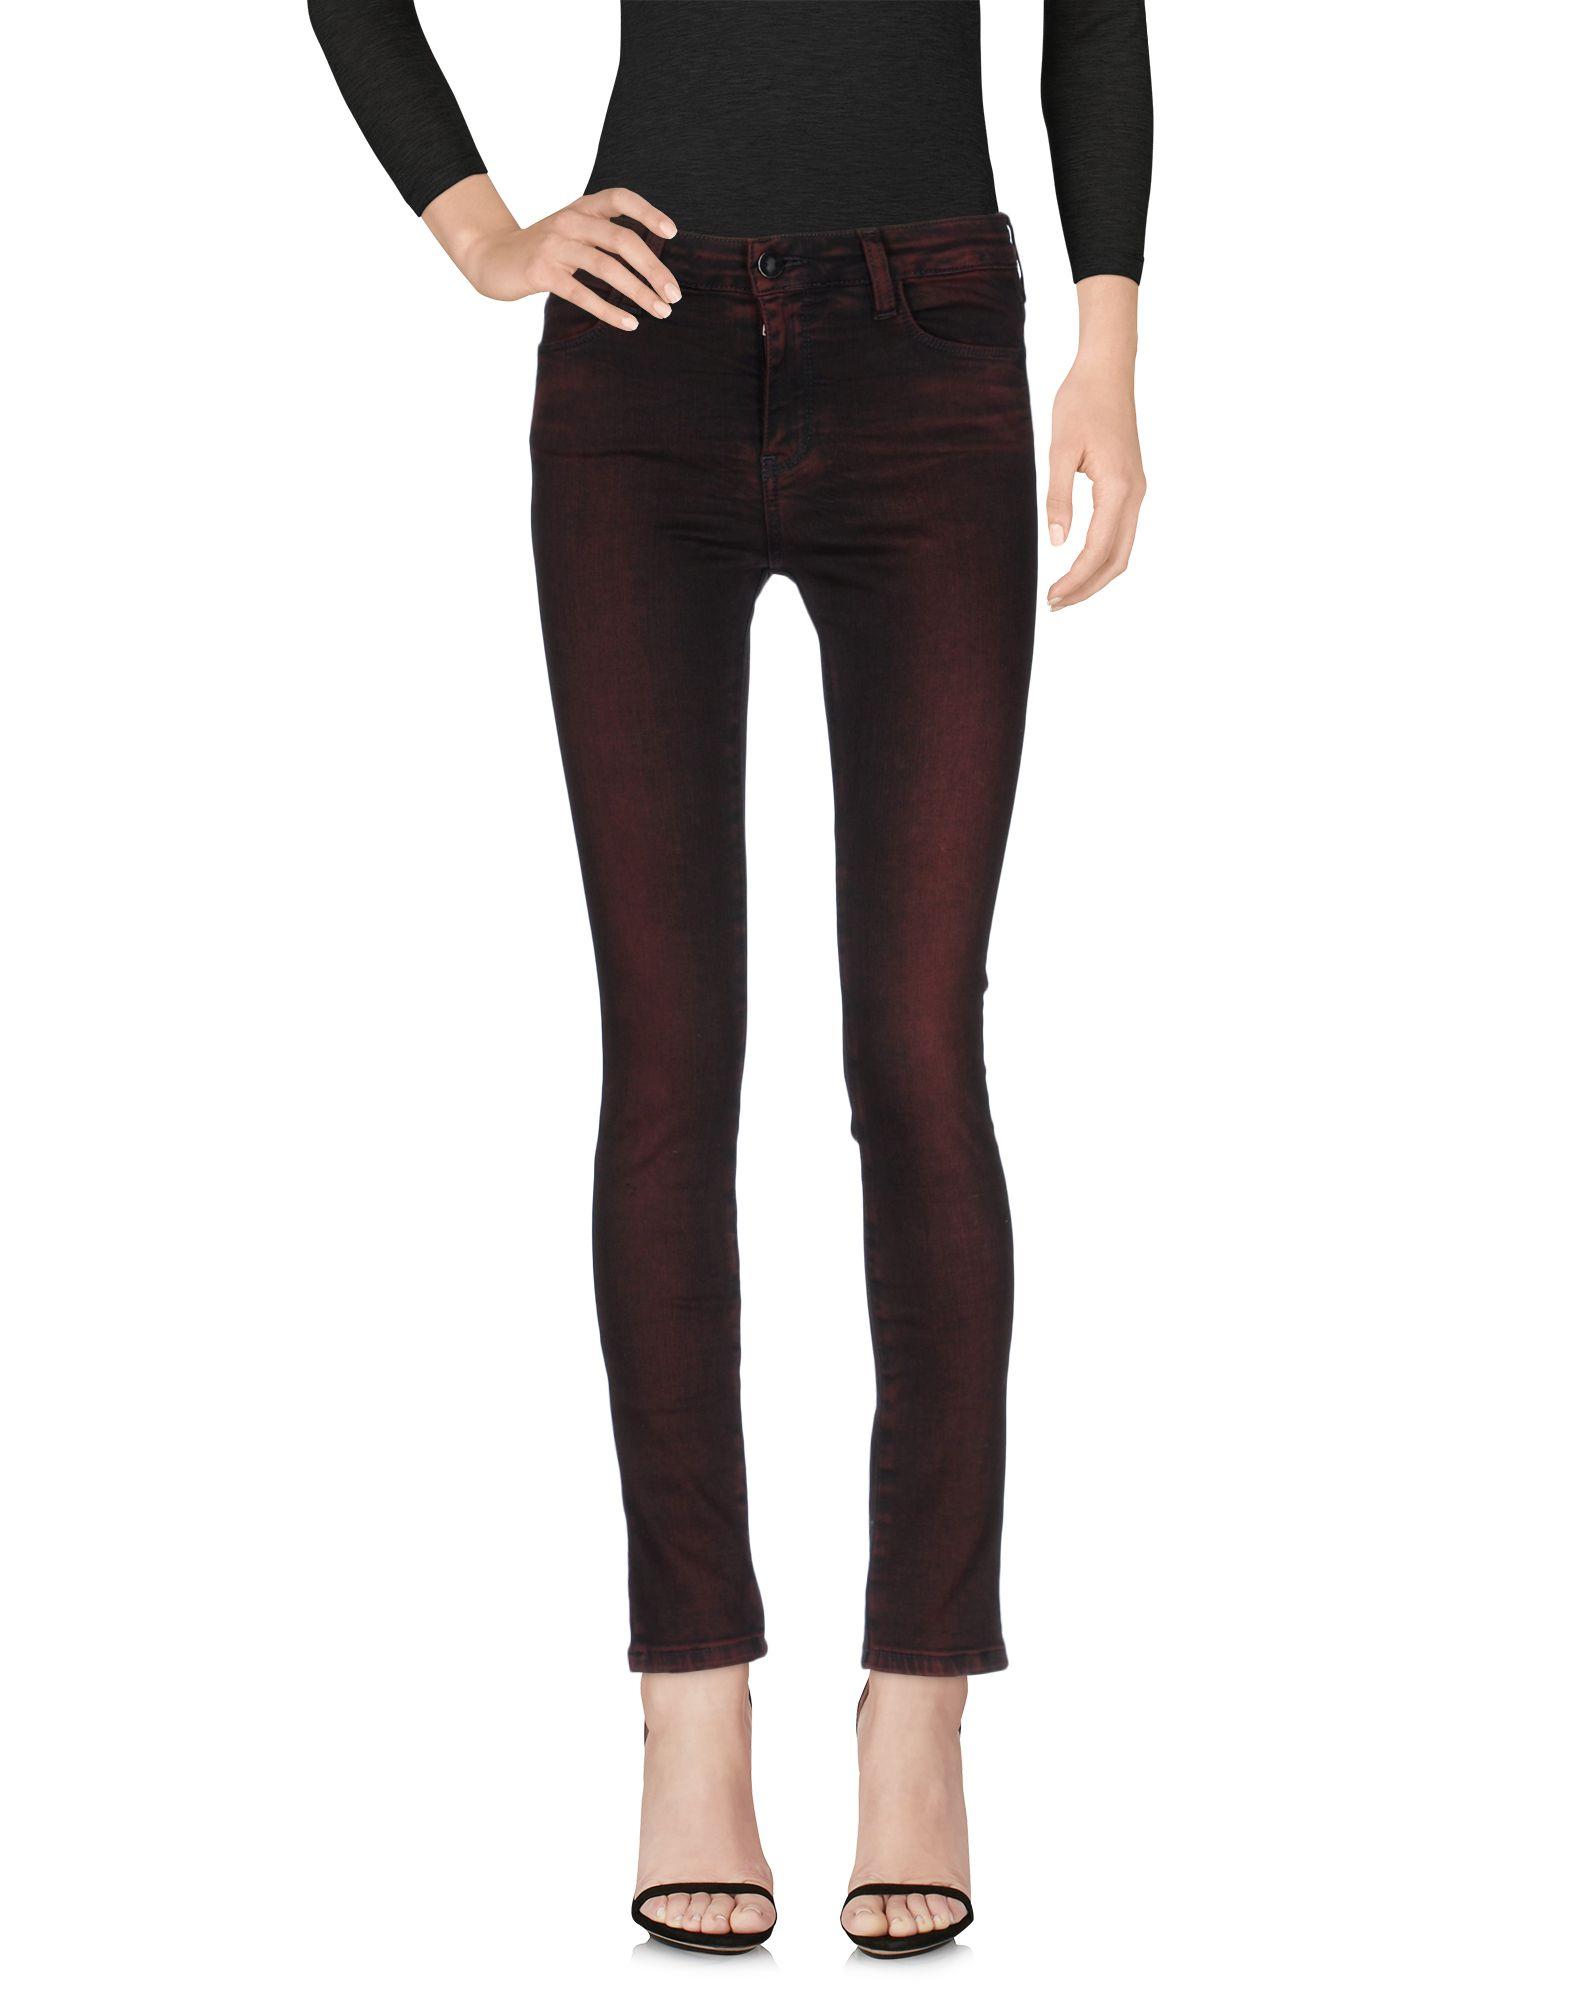 BROCKENBOW Damen Jeanshose Farbe Bordeaux Größe 1 jetztbilligerkaufen